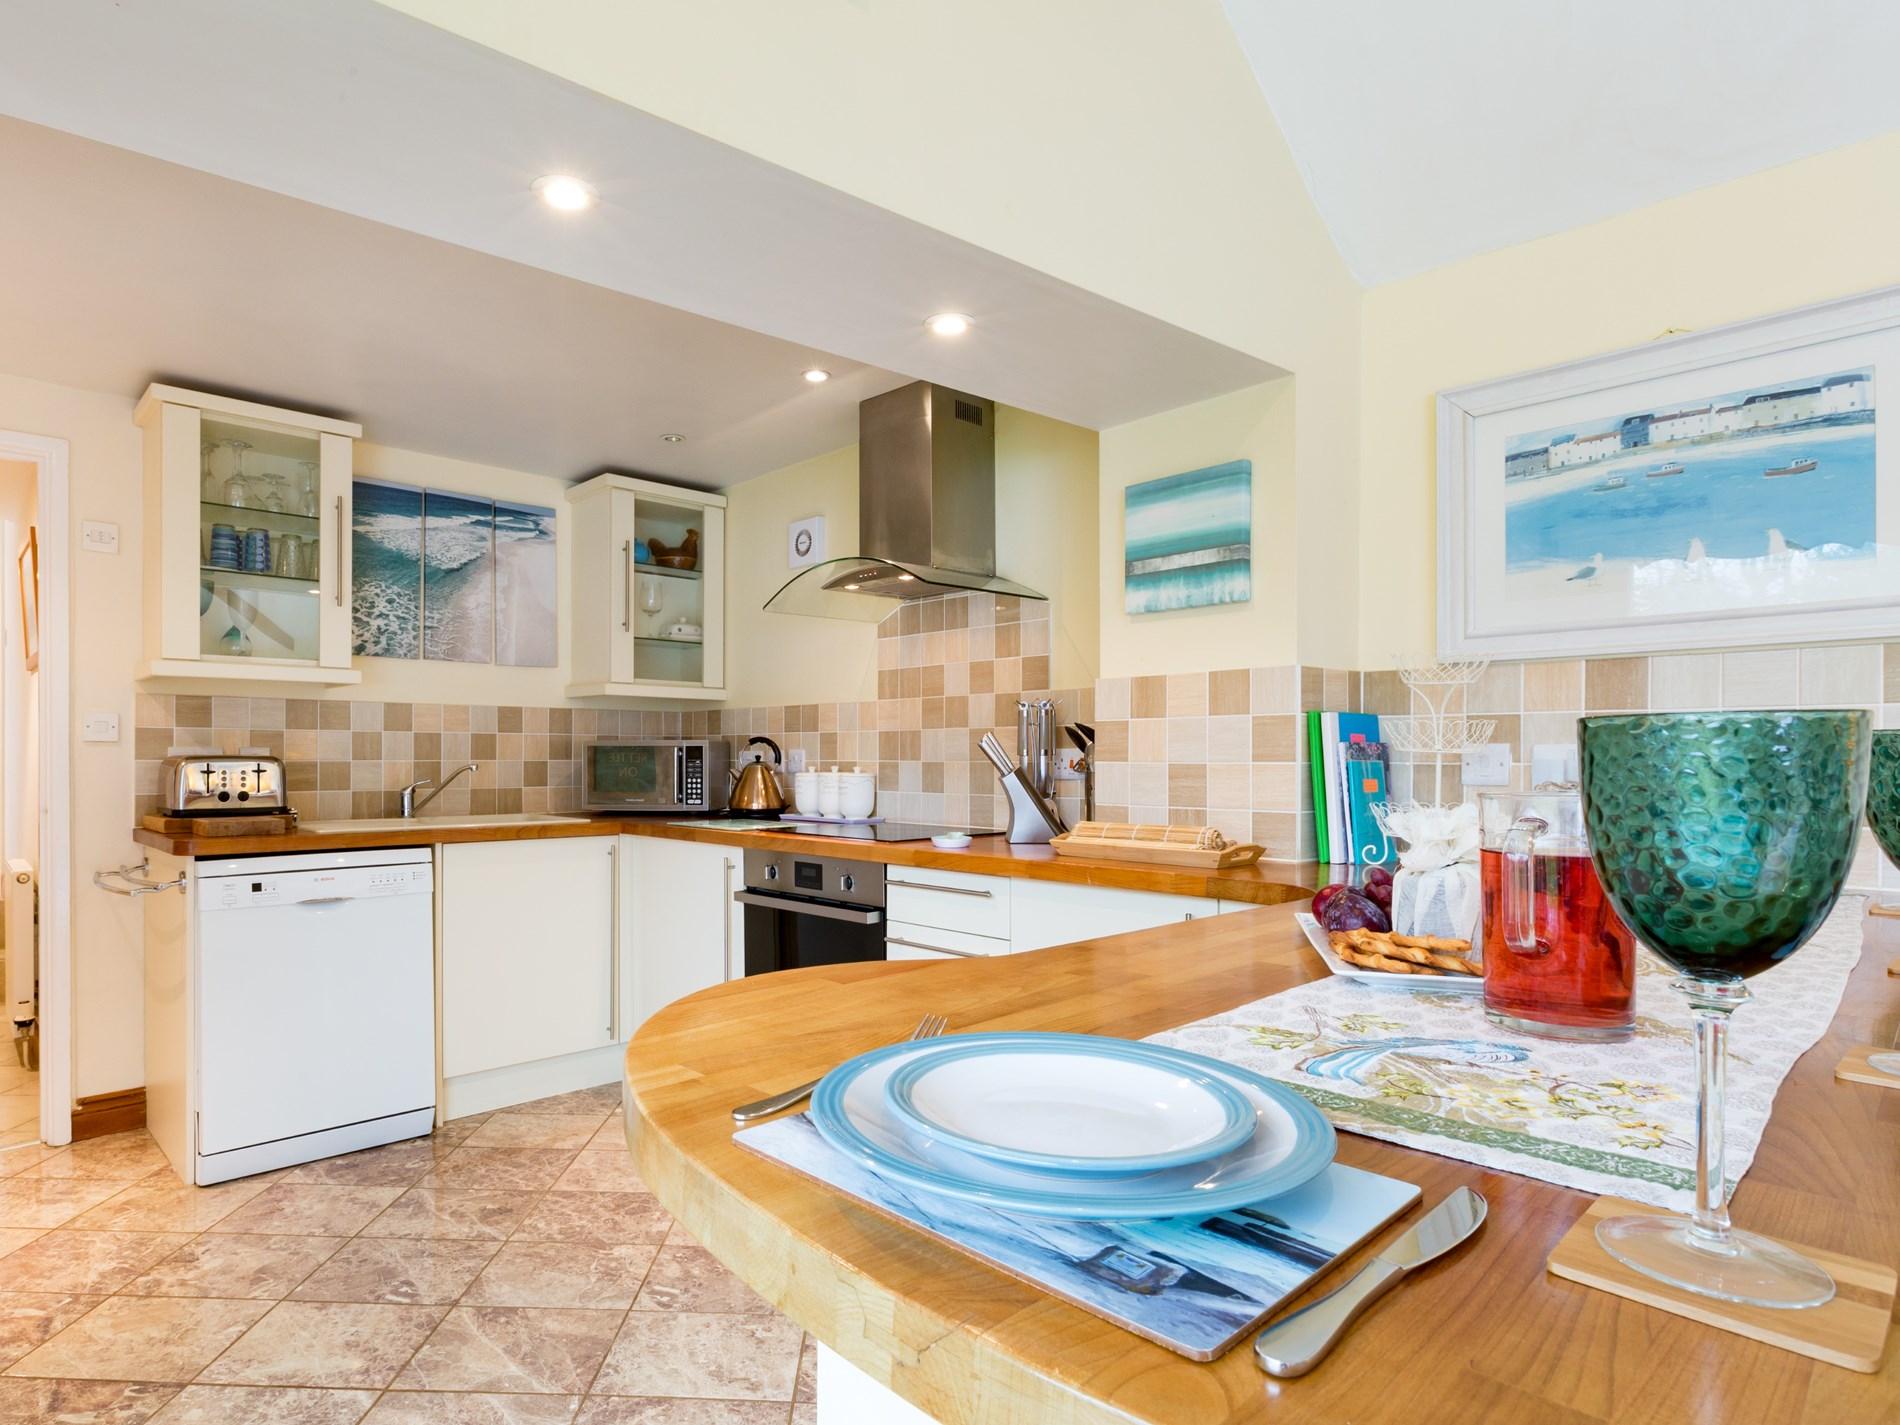 Modern kitchen with dining breakfast bar